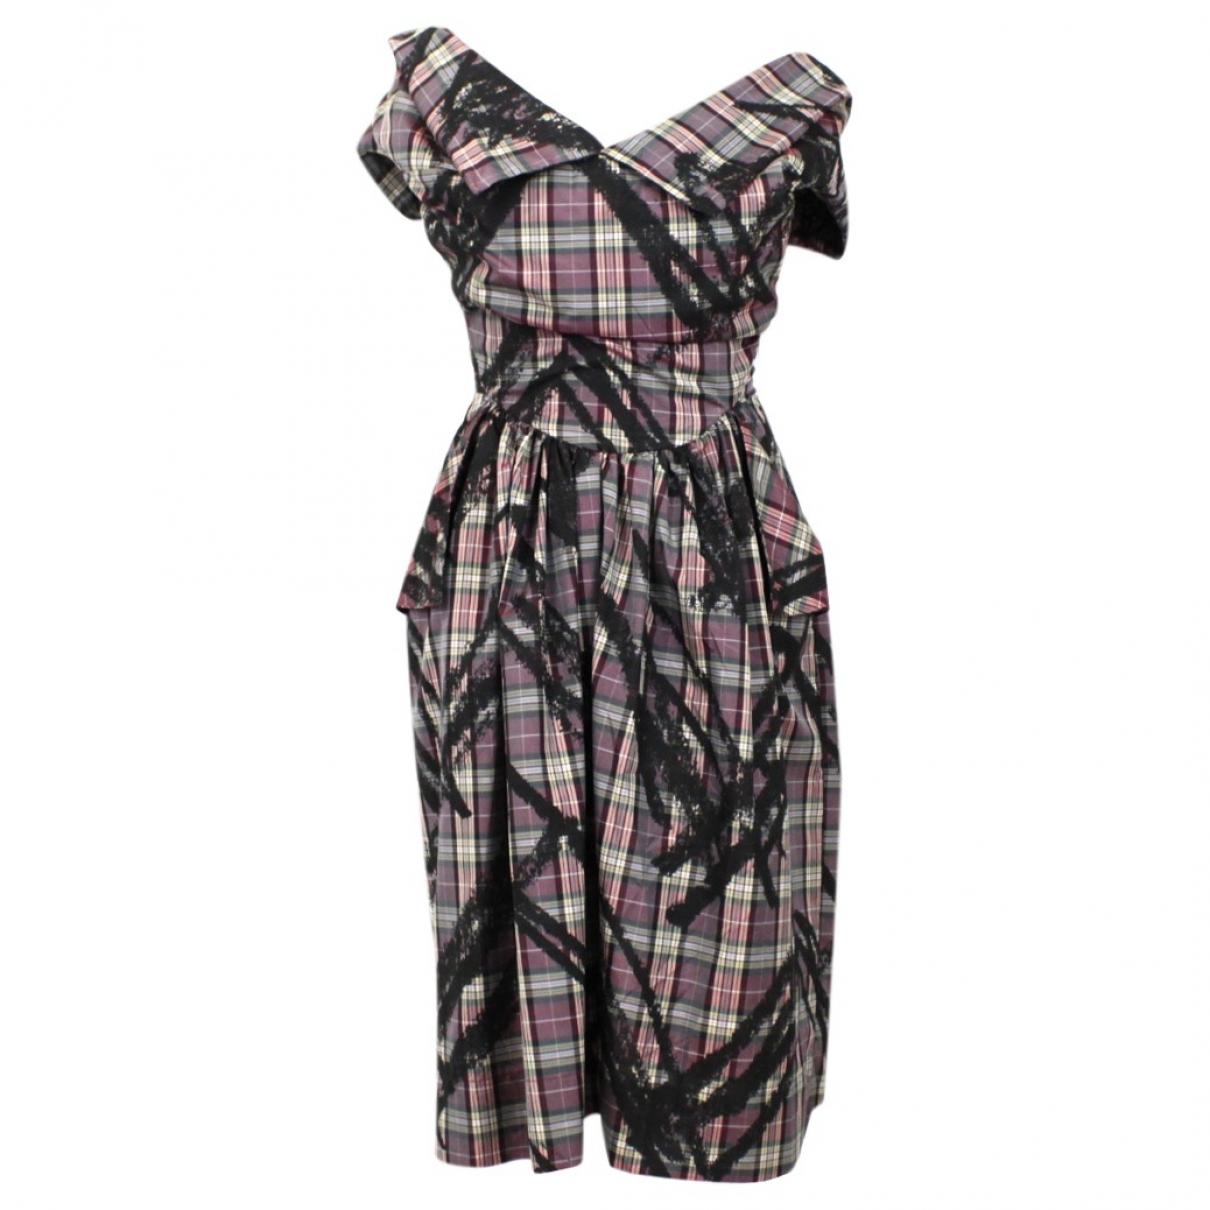 Vivienne Westwood Anglomania \N Purple dress for Women 40 IT